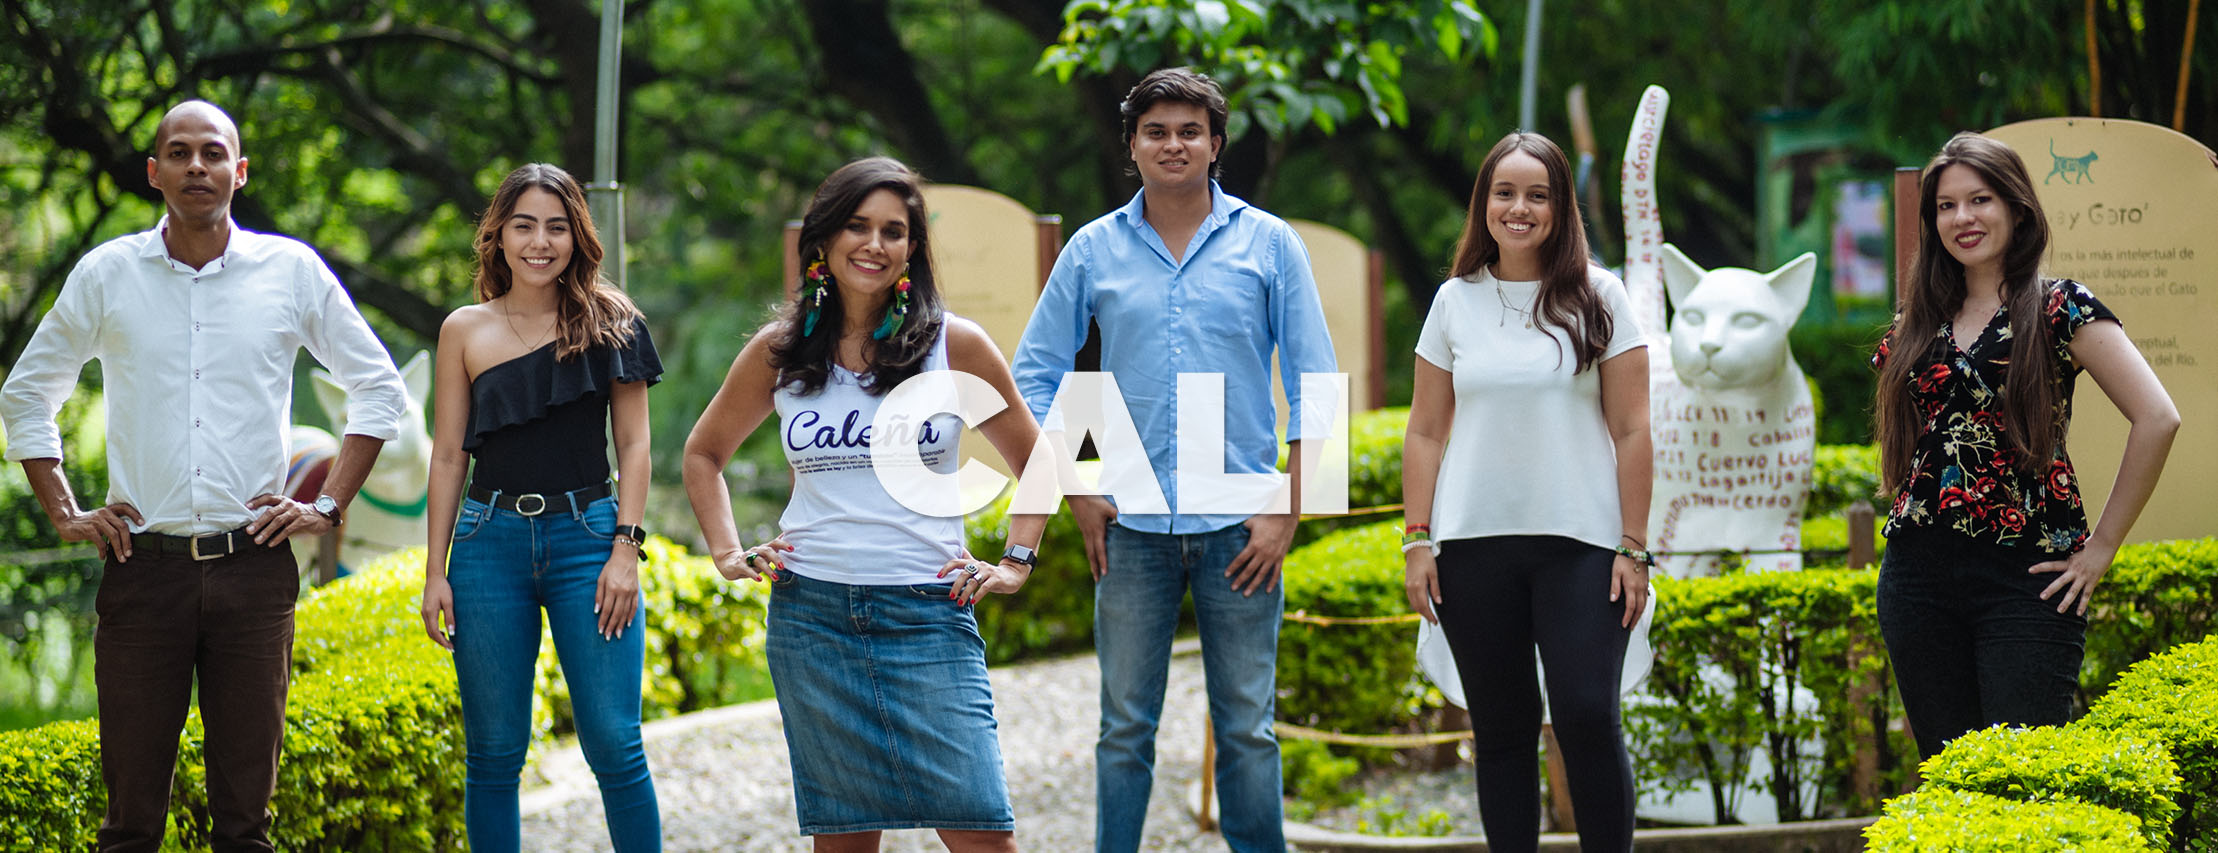 equipo_cali